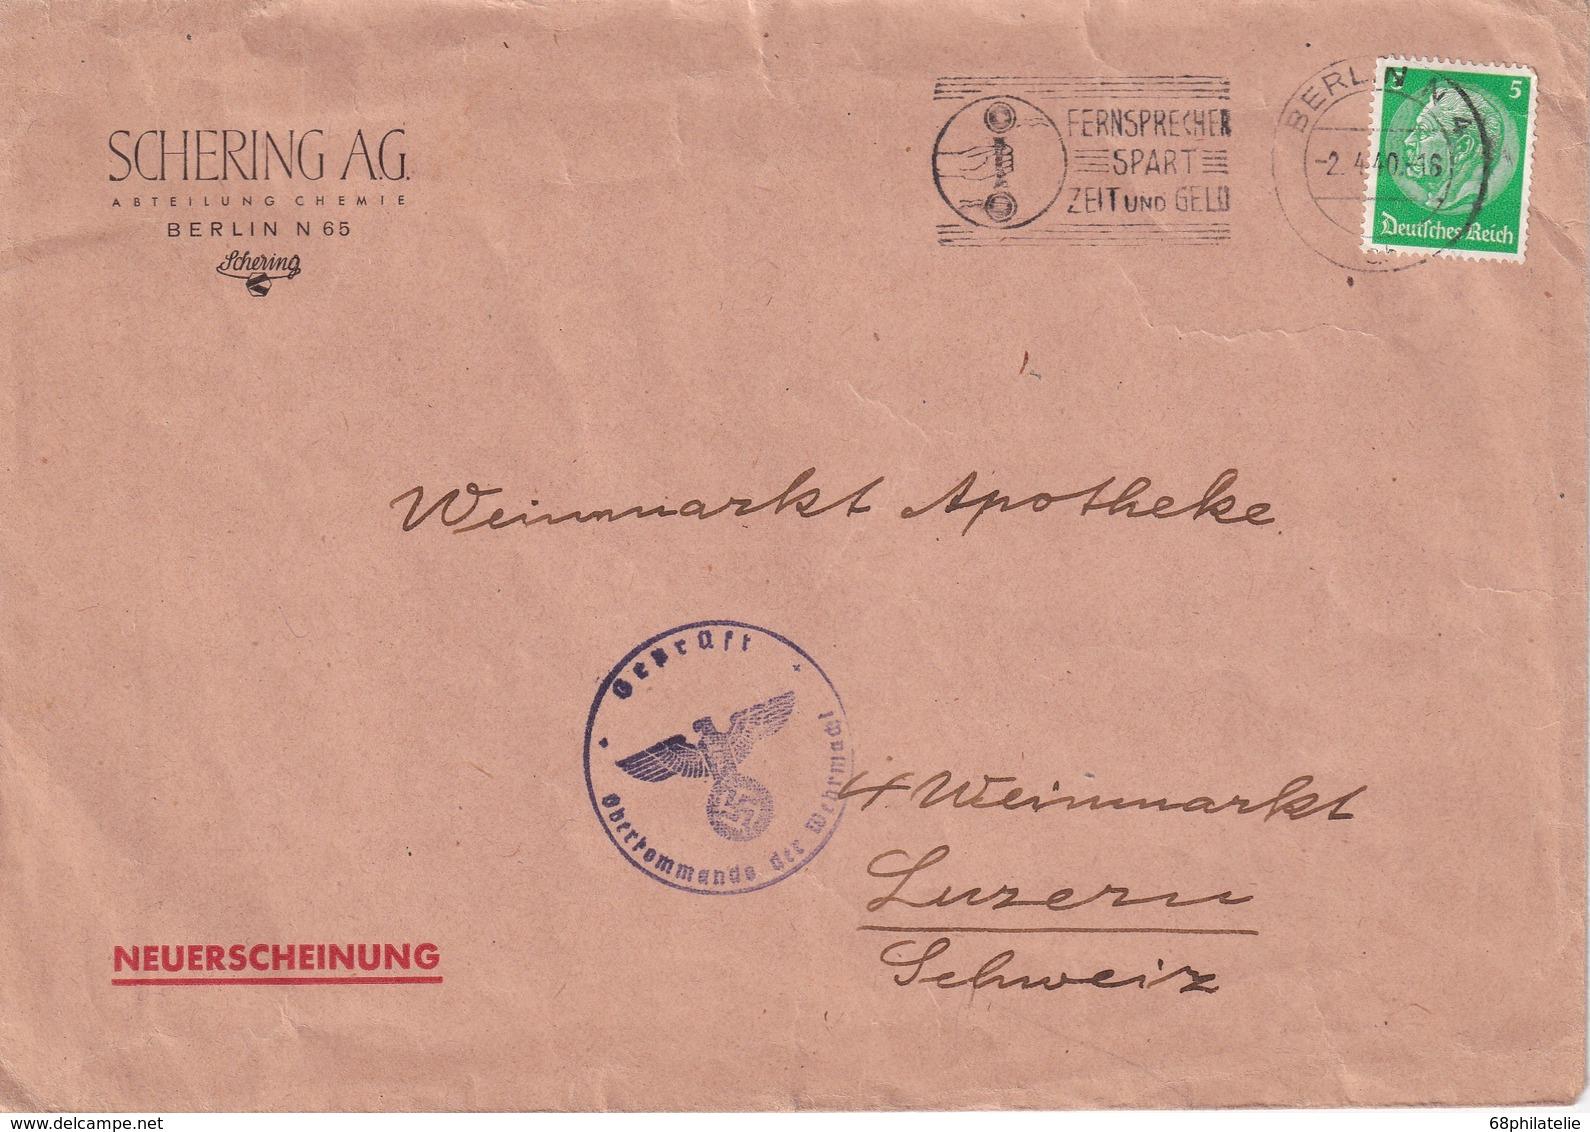 ALLEMAGNE 1940 LETTRE CENSUREE DE BERLIN POUR LUCERNE - Deutschland